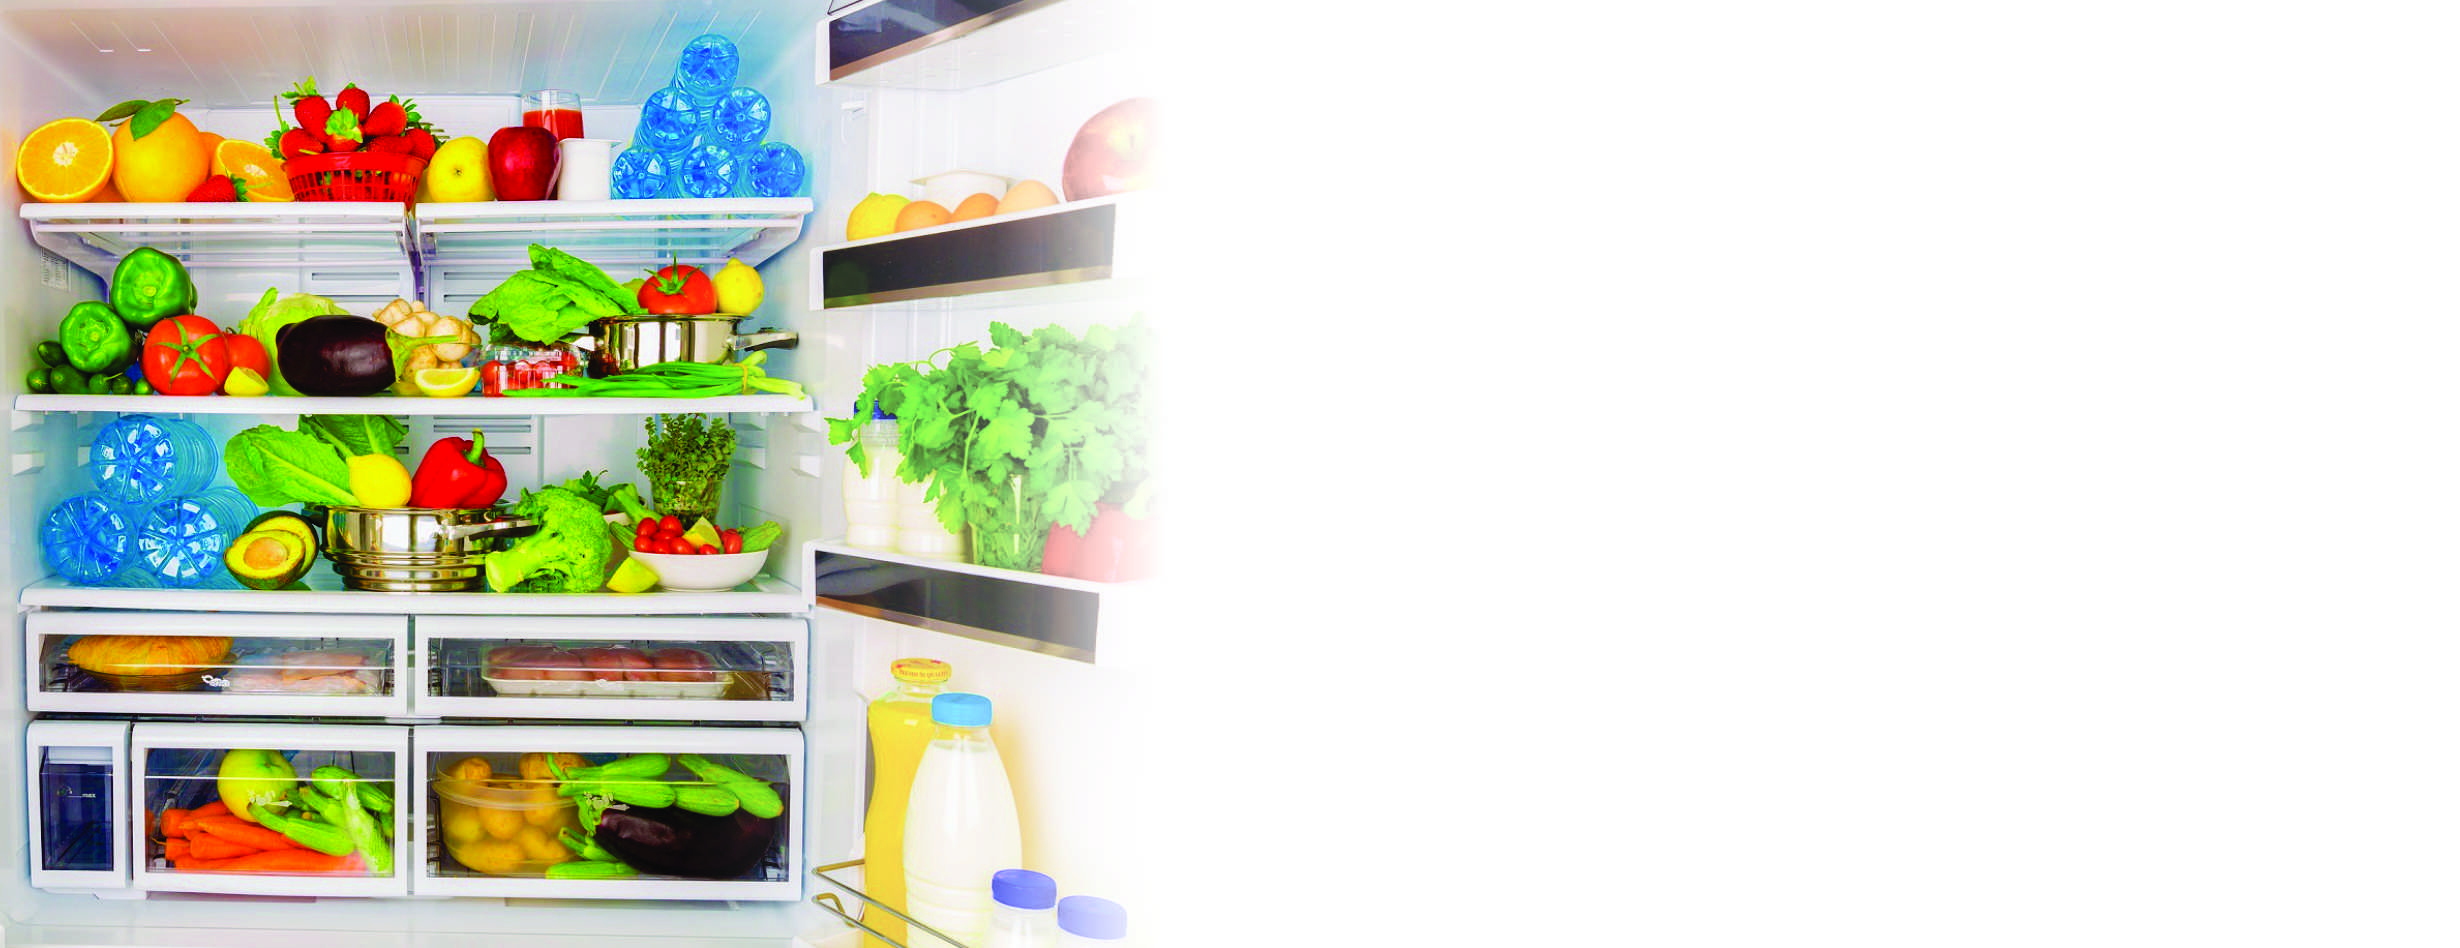 Ozonator in refrigerator